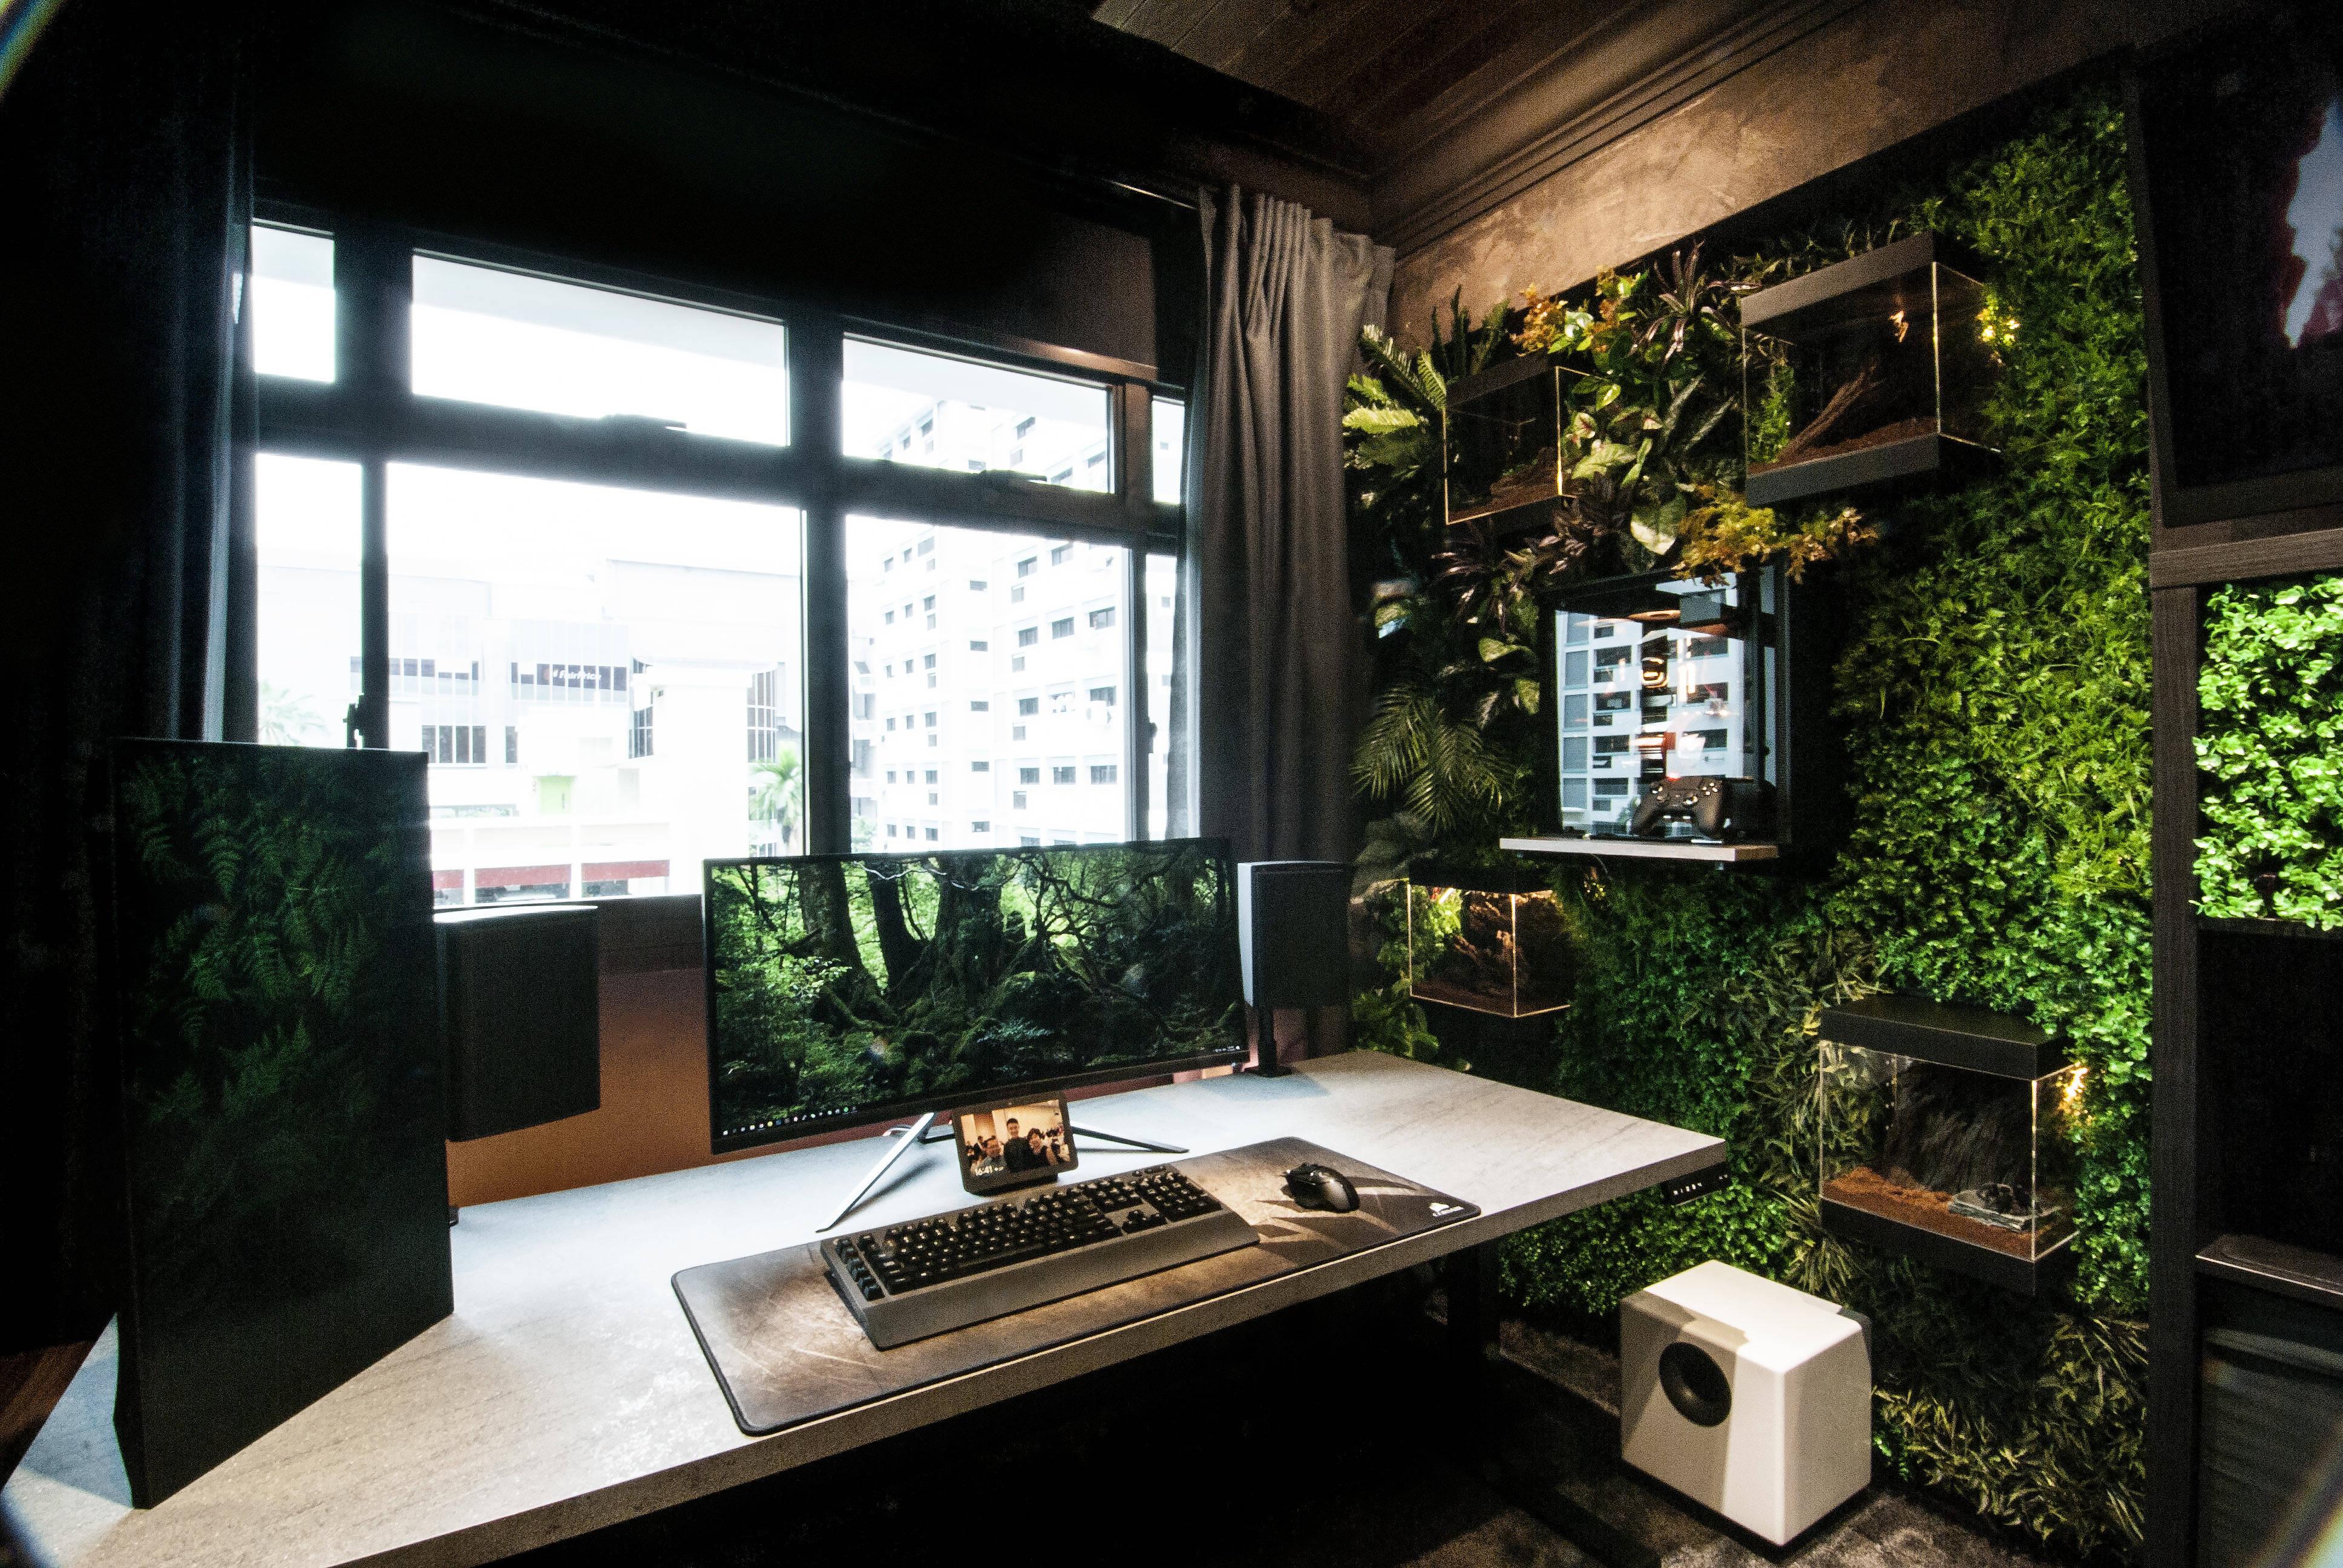 kelvinlee's Setup - Nature meets tech | Scooget